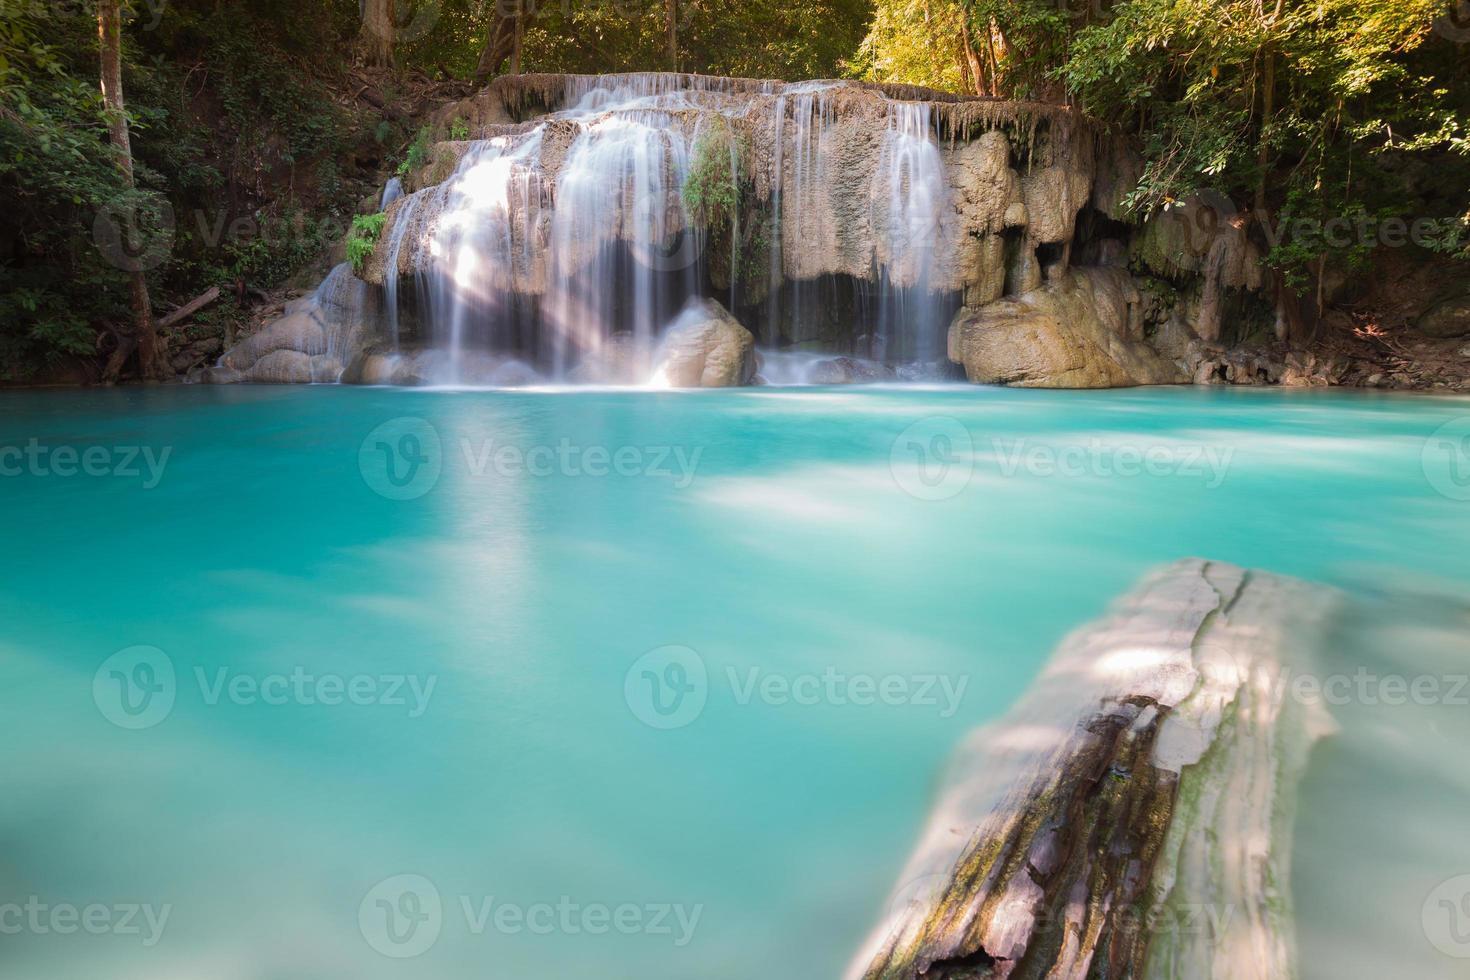 queda de água de fluxo azul localizar na selva profunda floresta foto